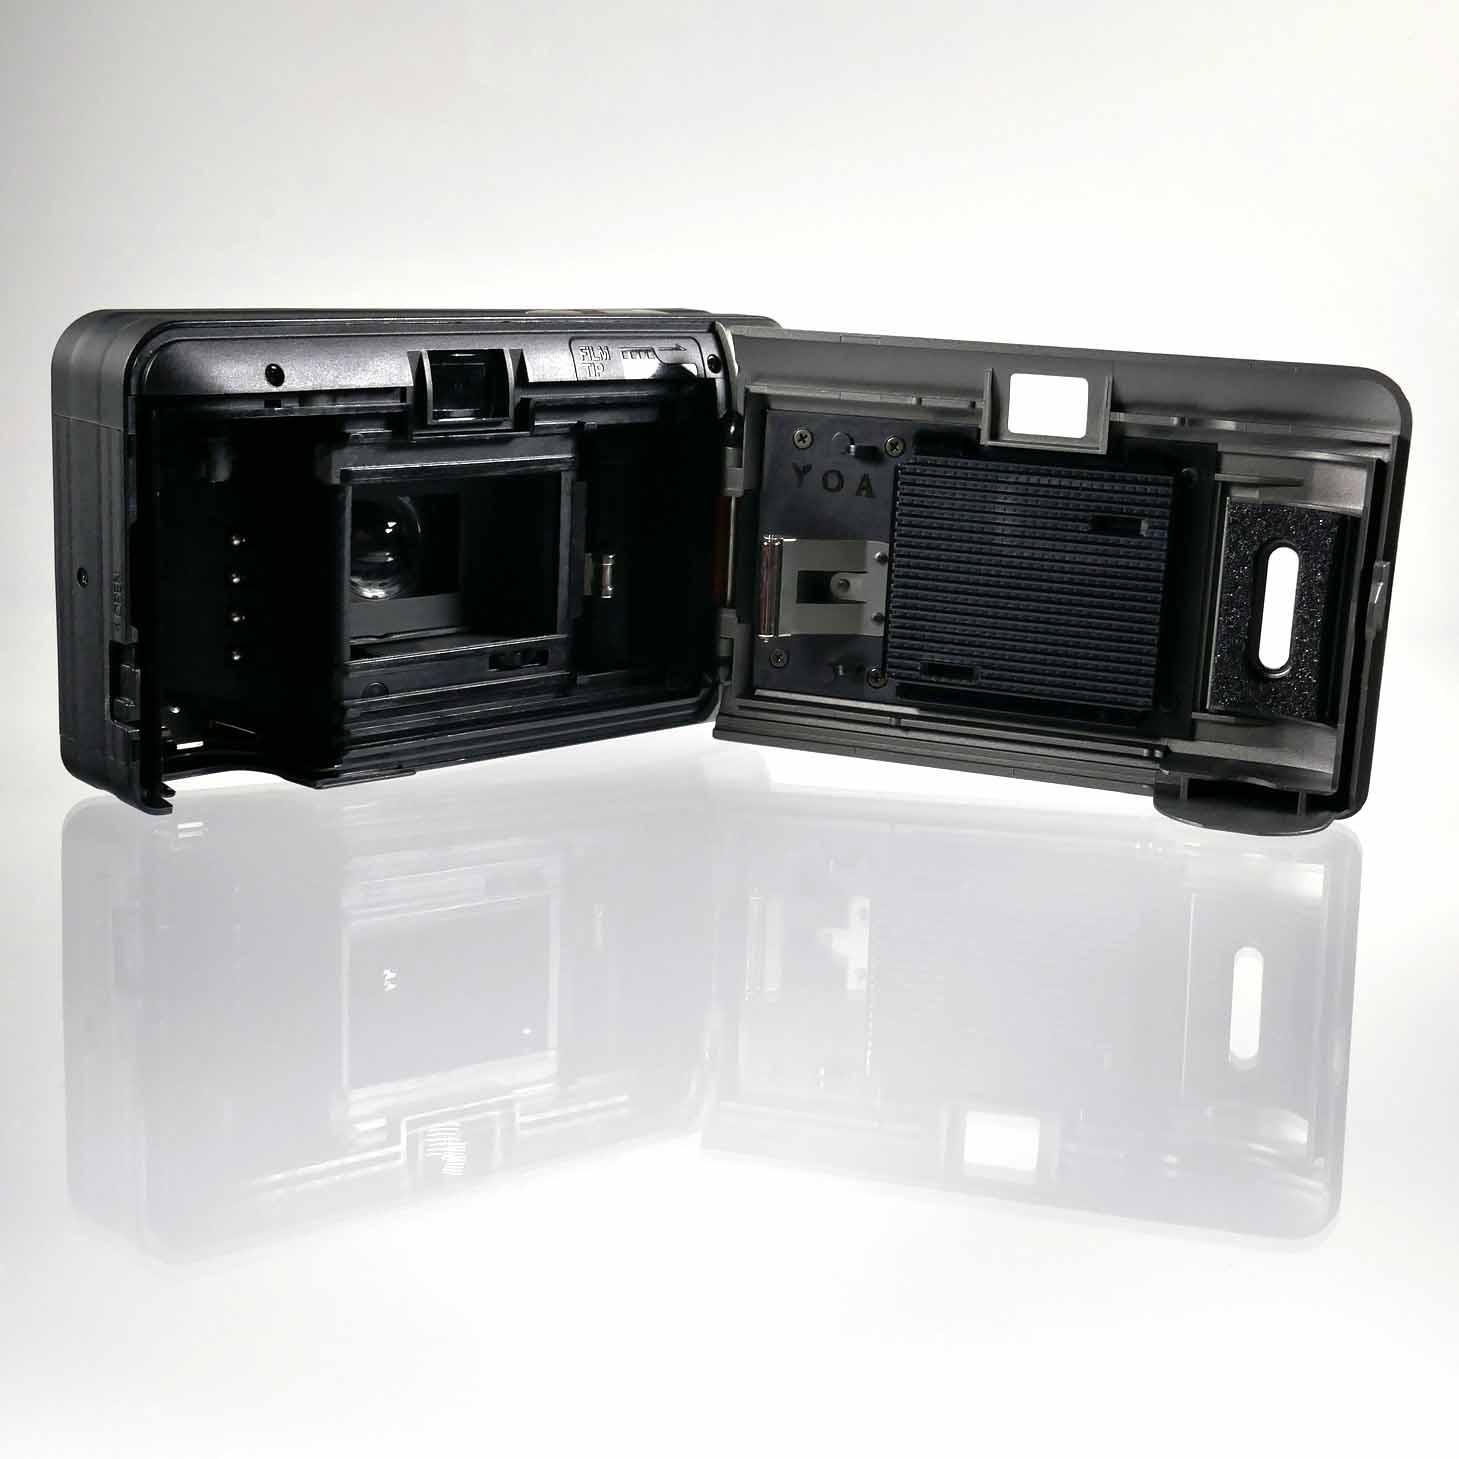 clean-cameras-Konica-Big.mini-02